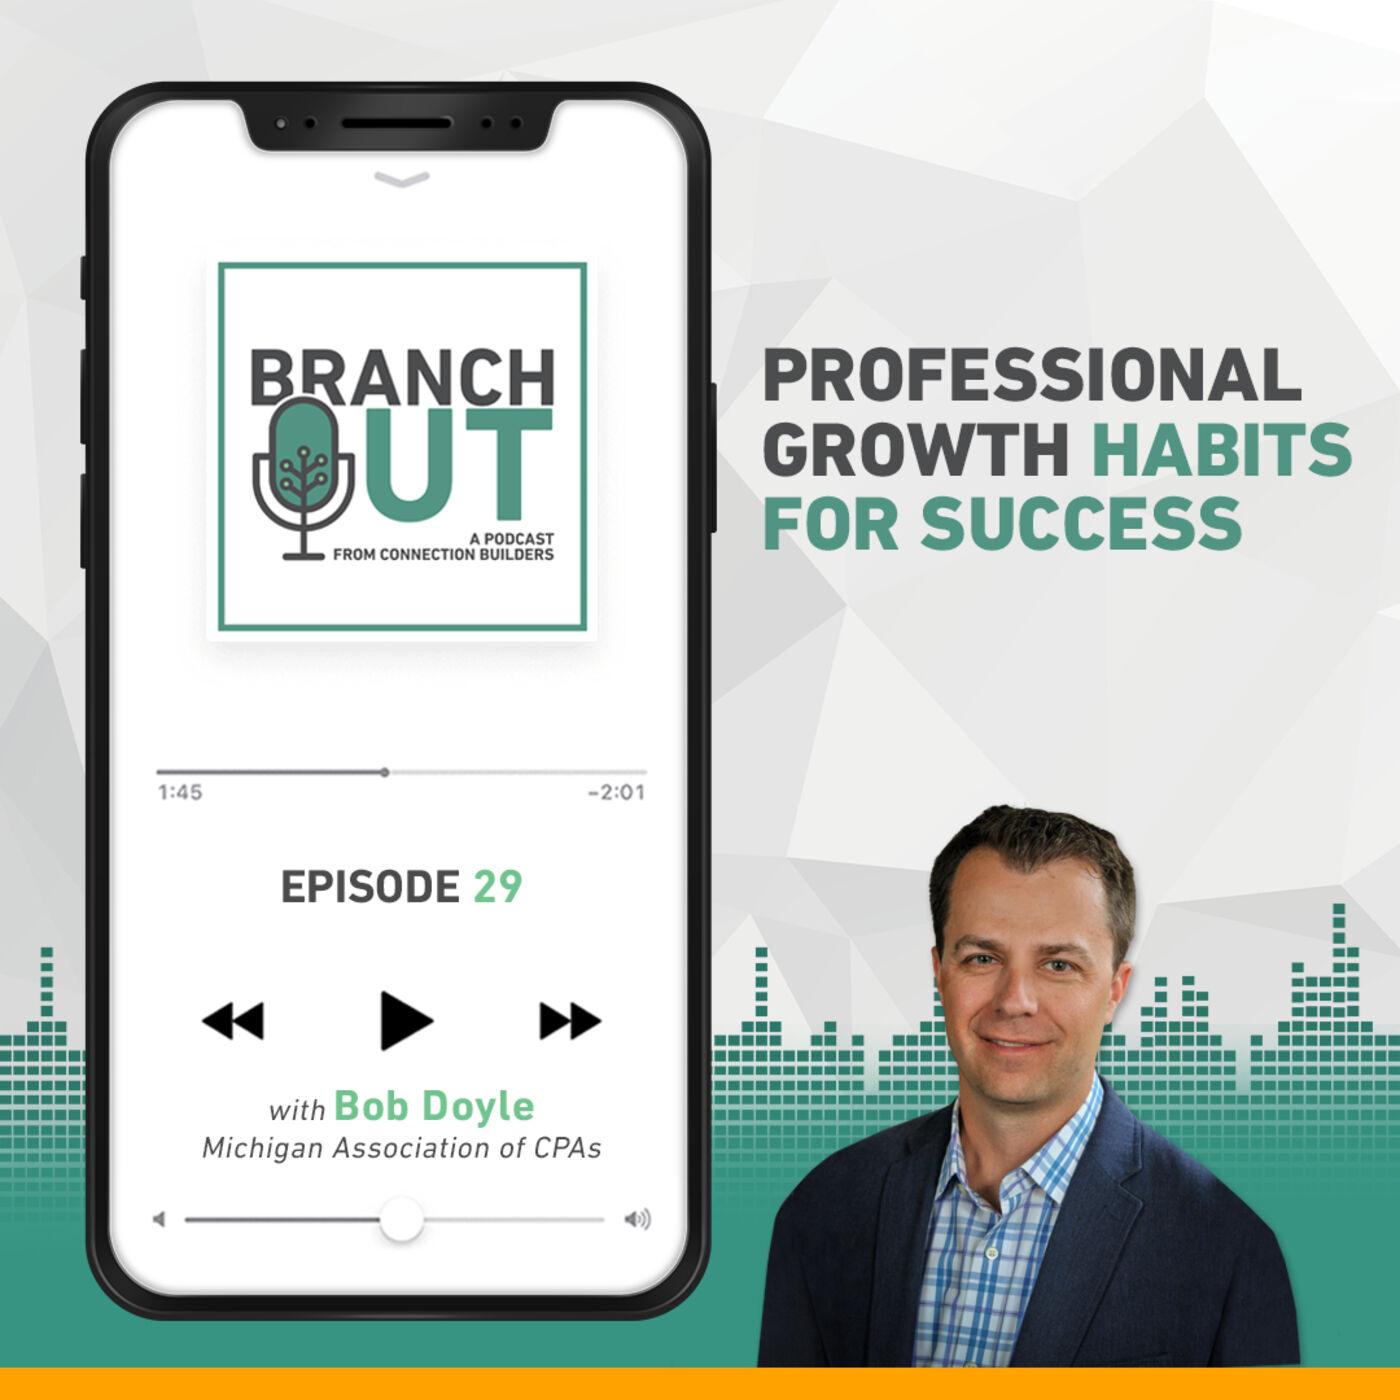 Growth Habits For Success - Bob Doyle